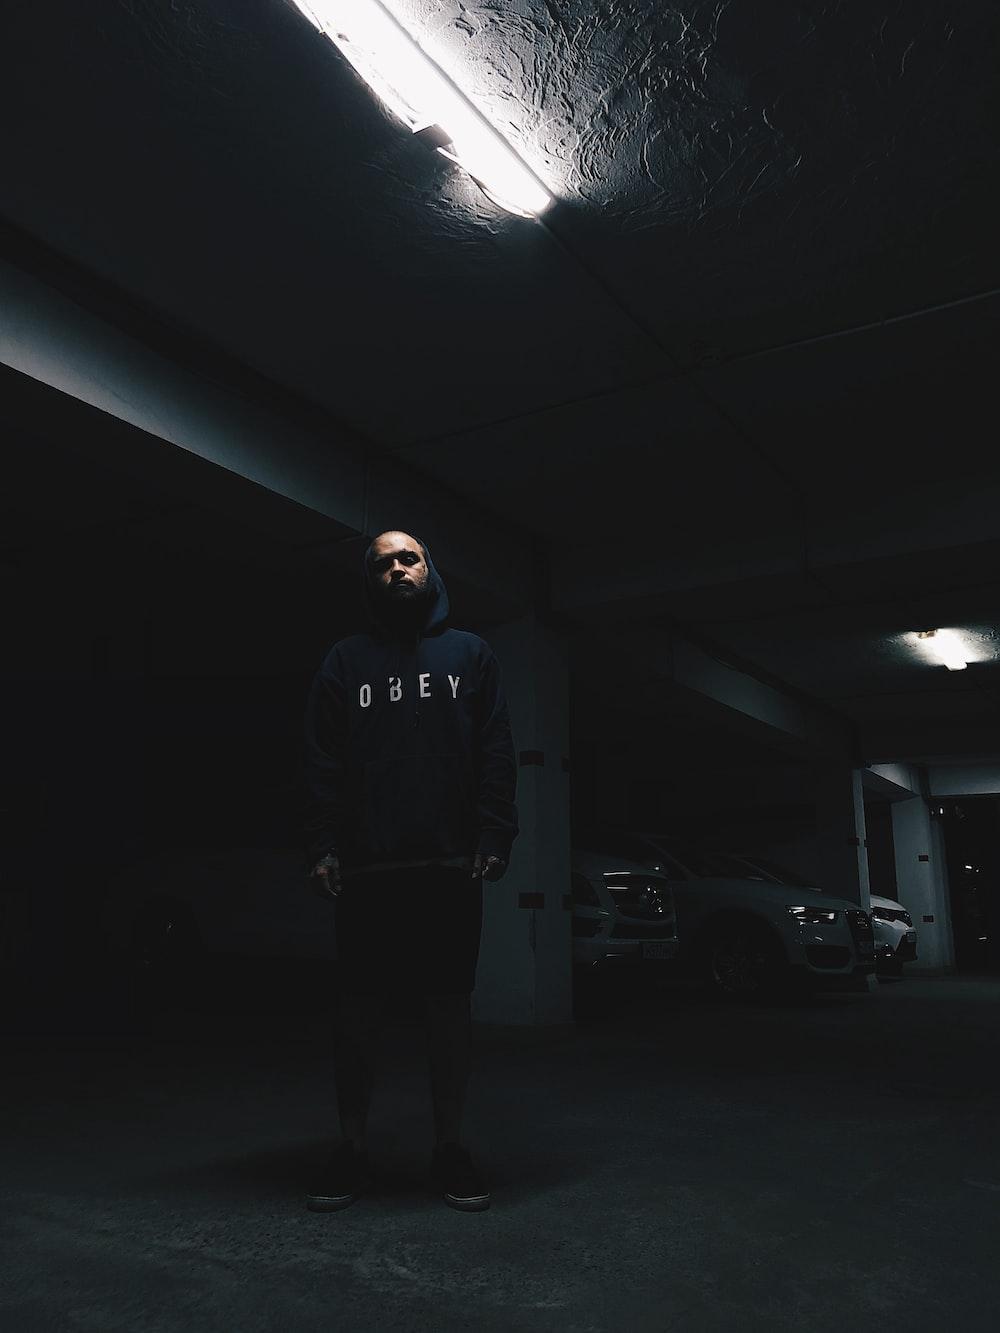 man standing inside building parking lot